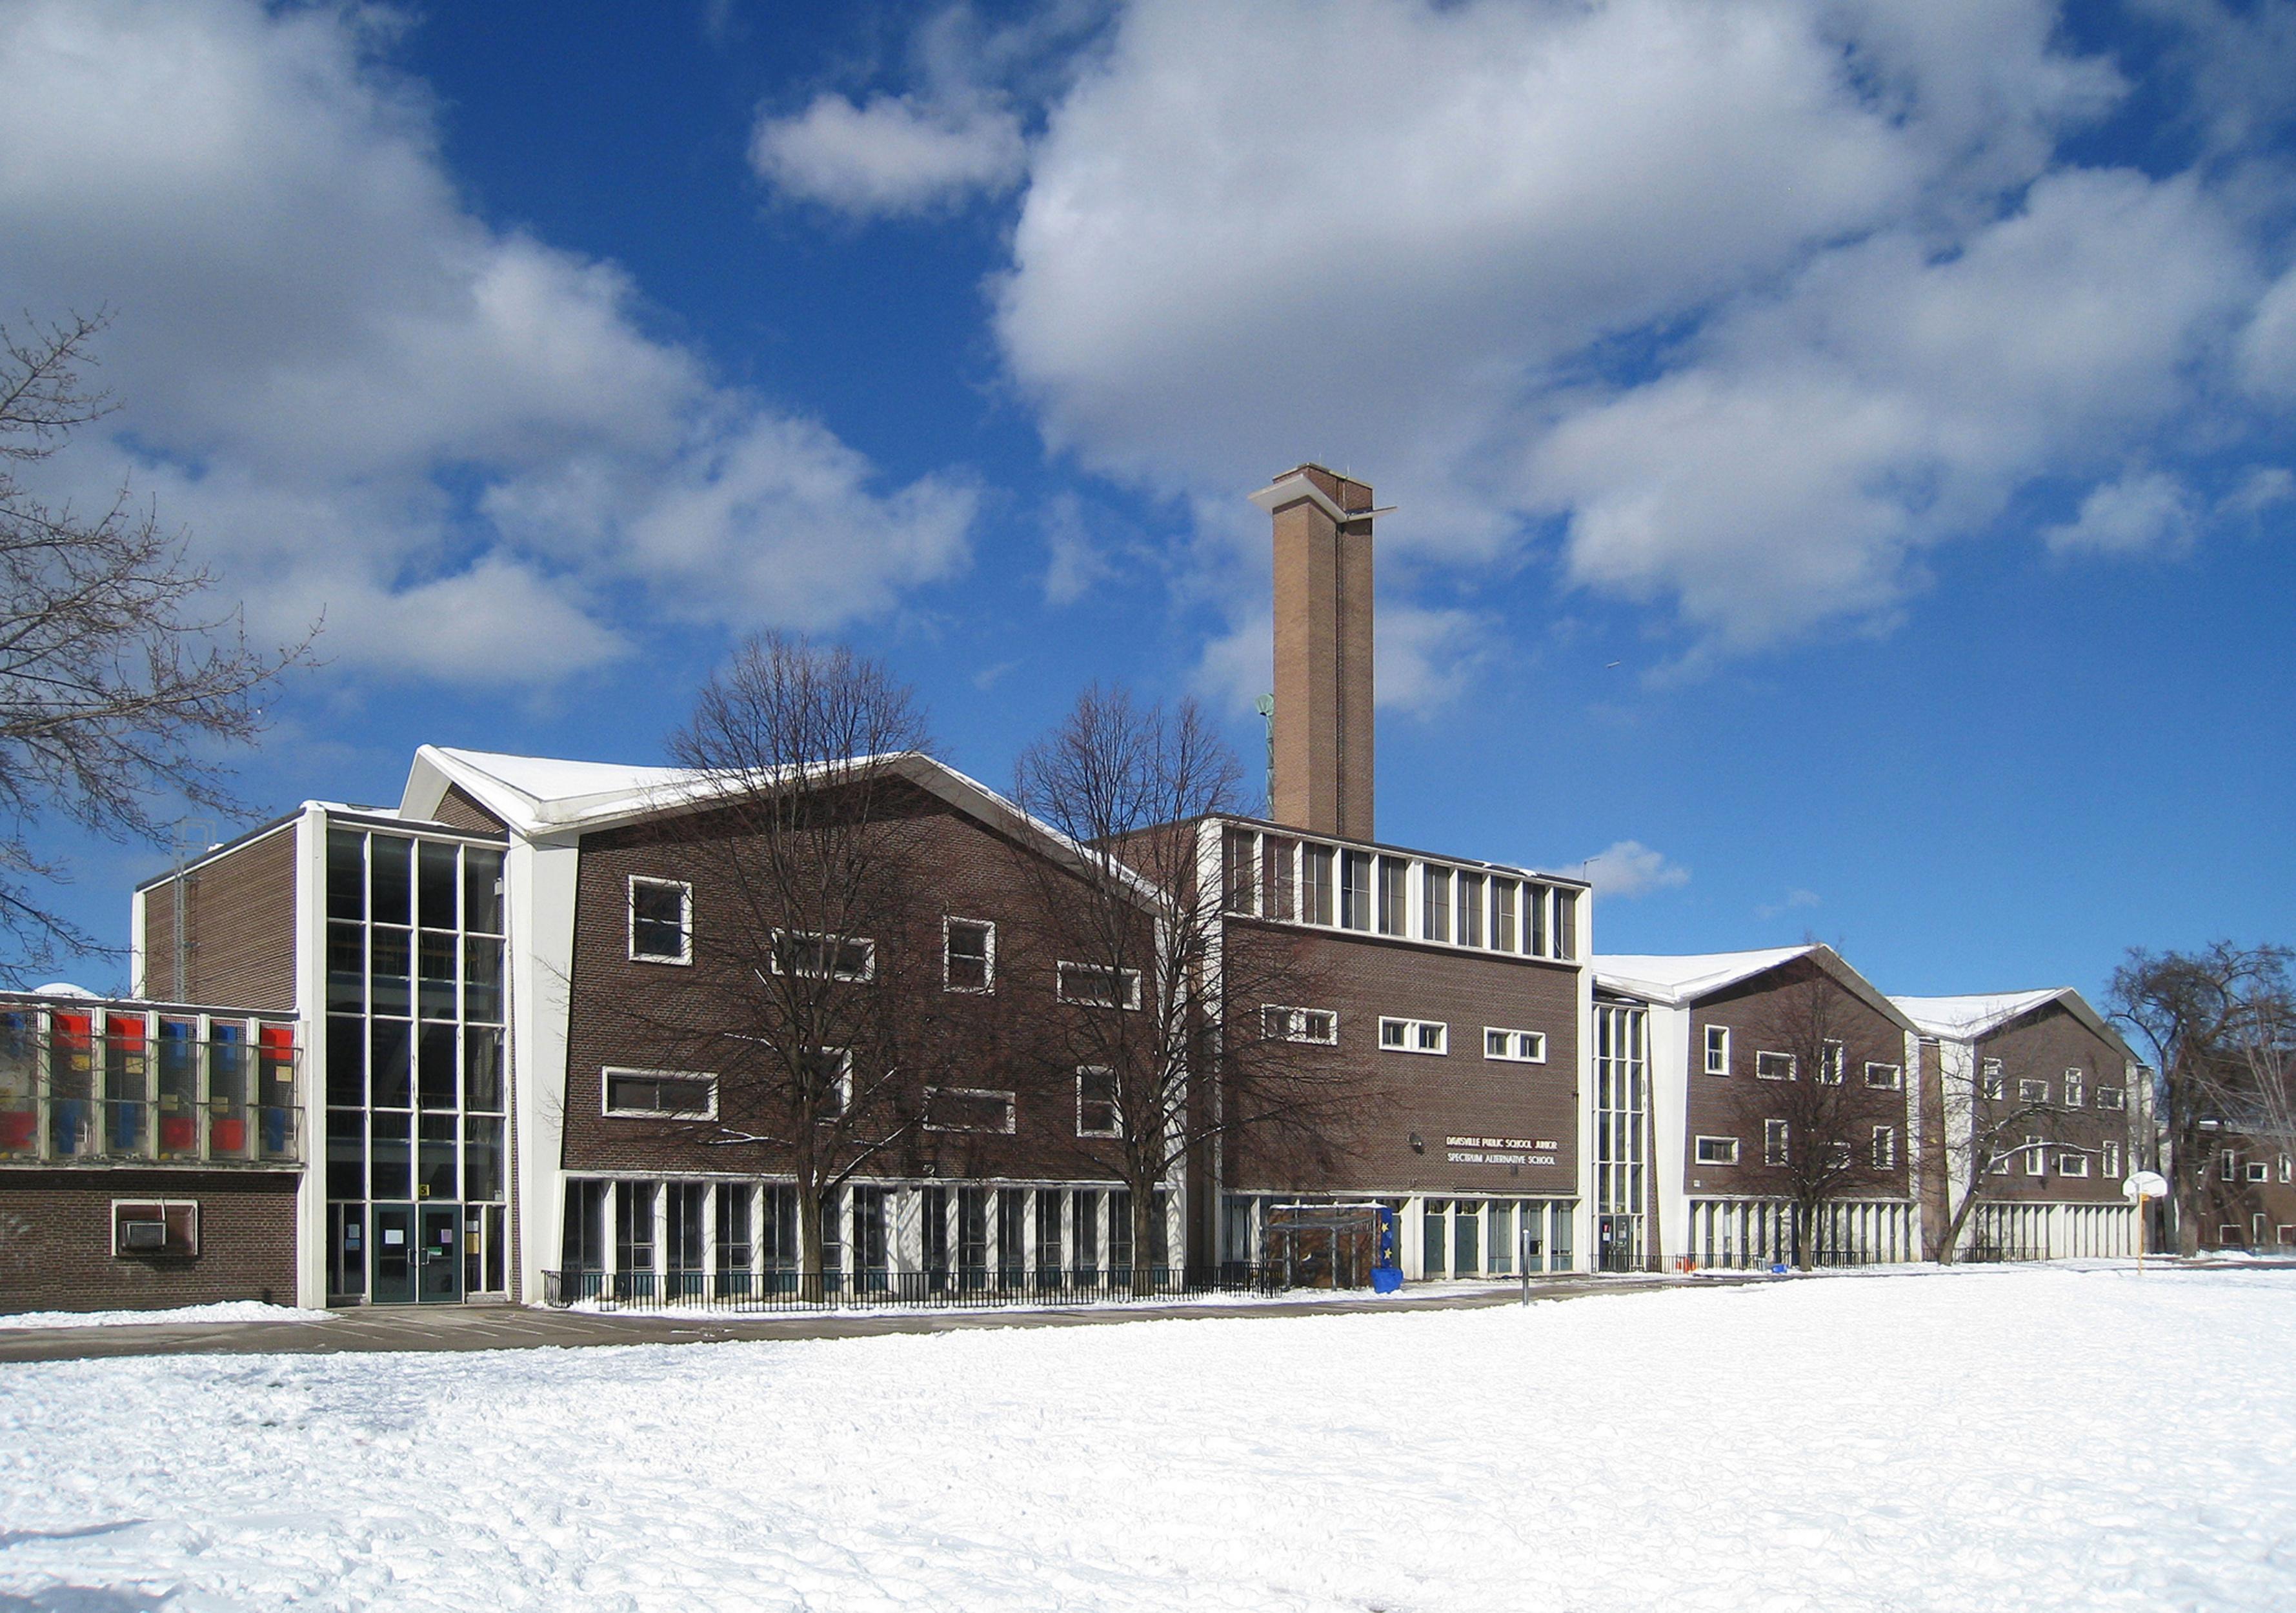 davisville public school